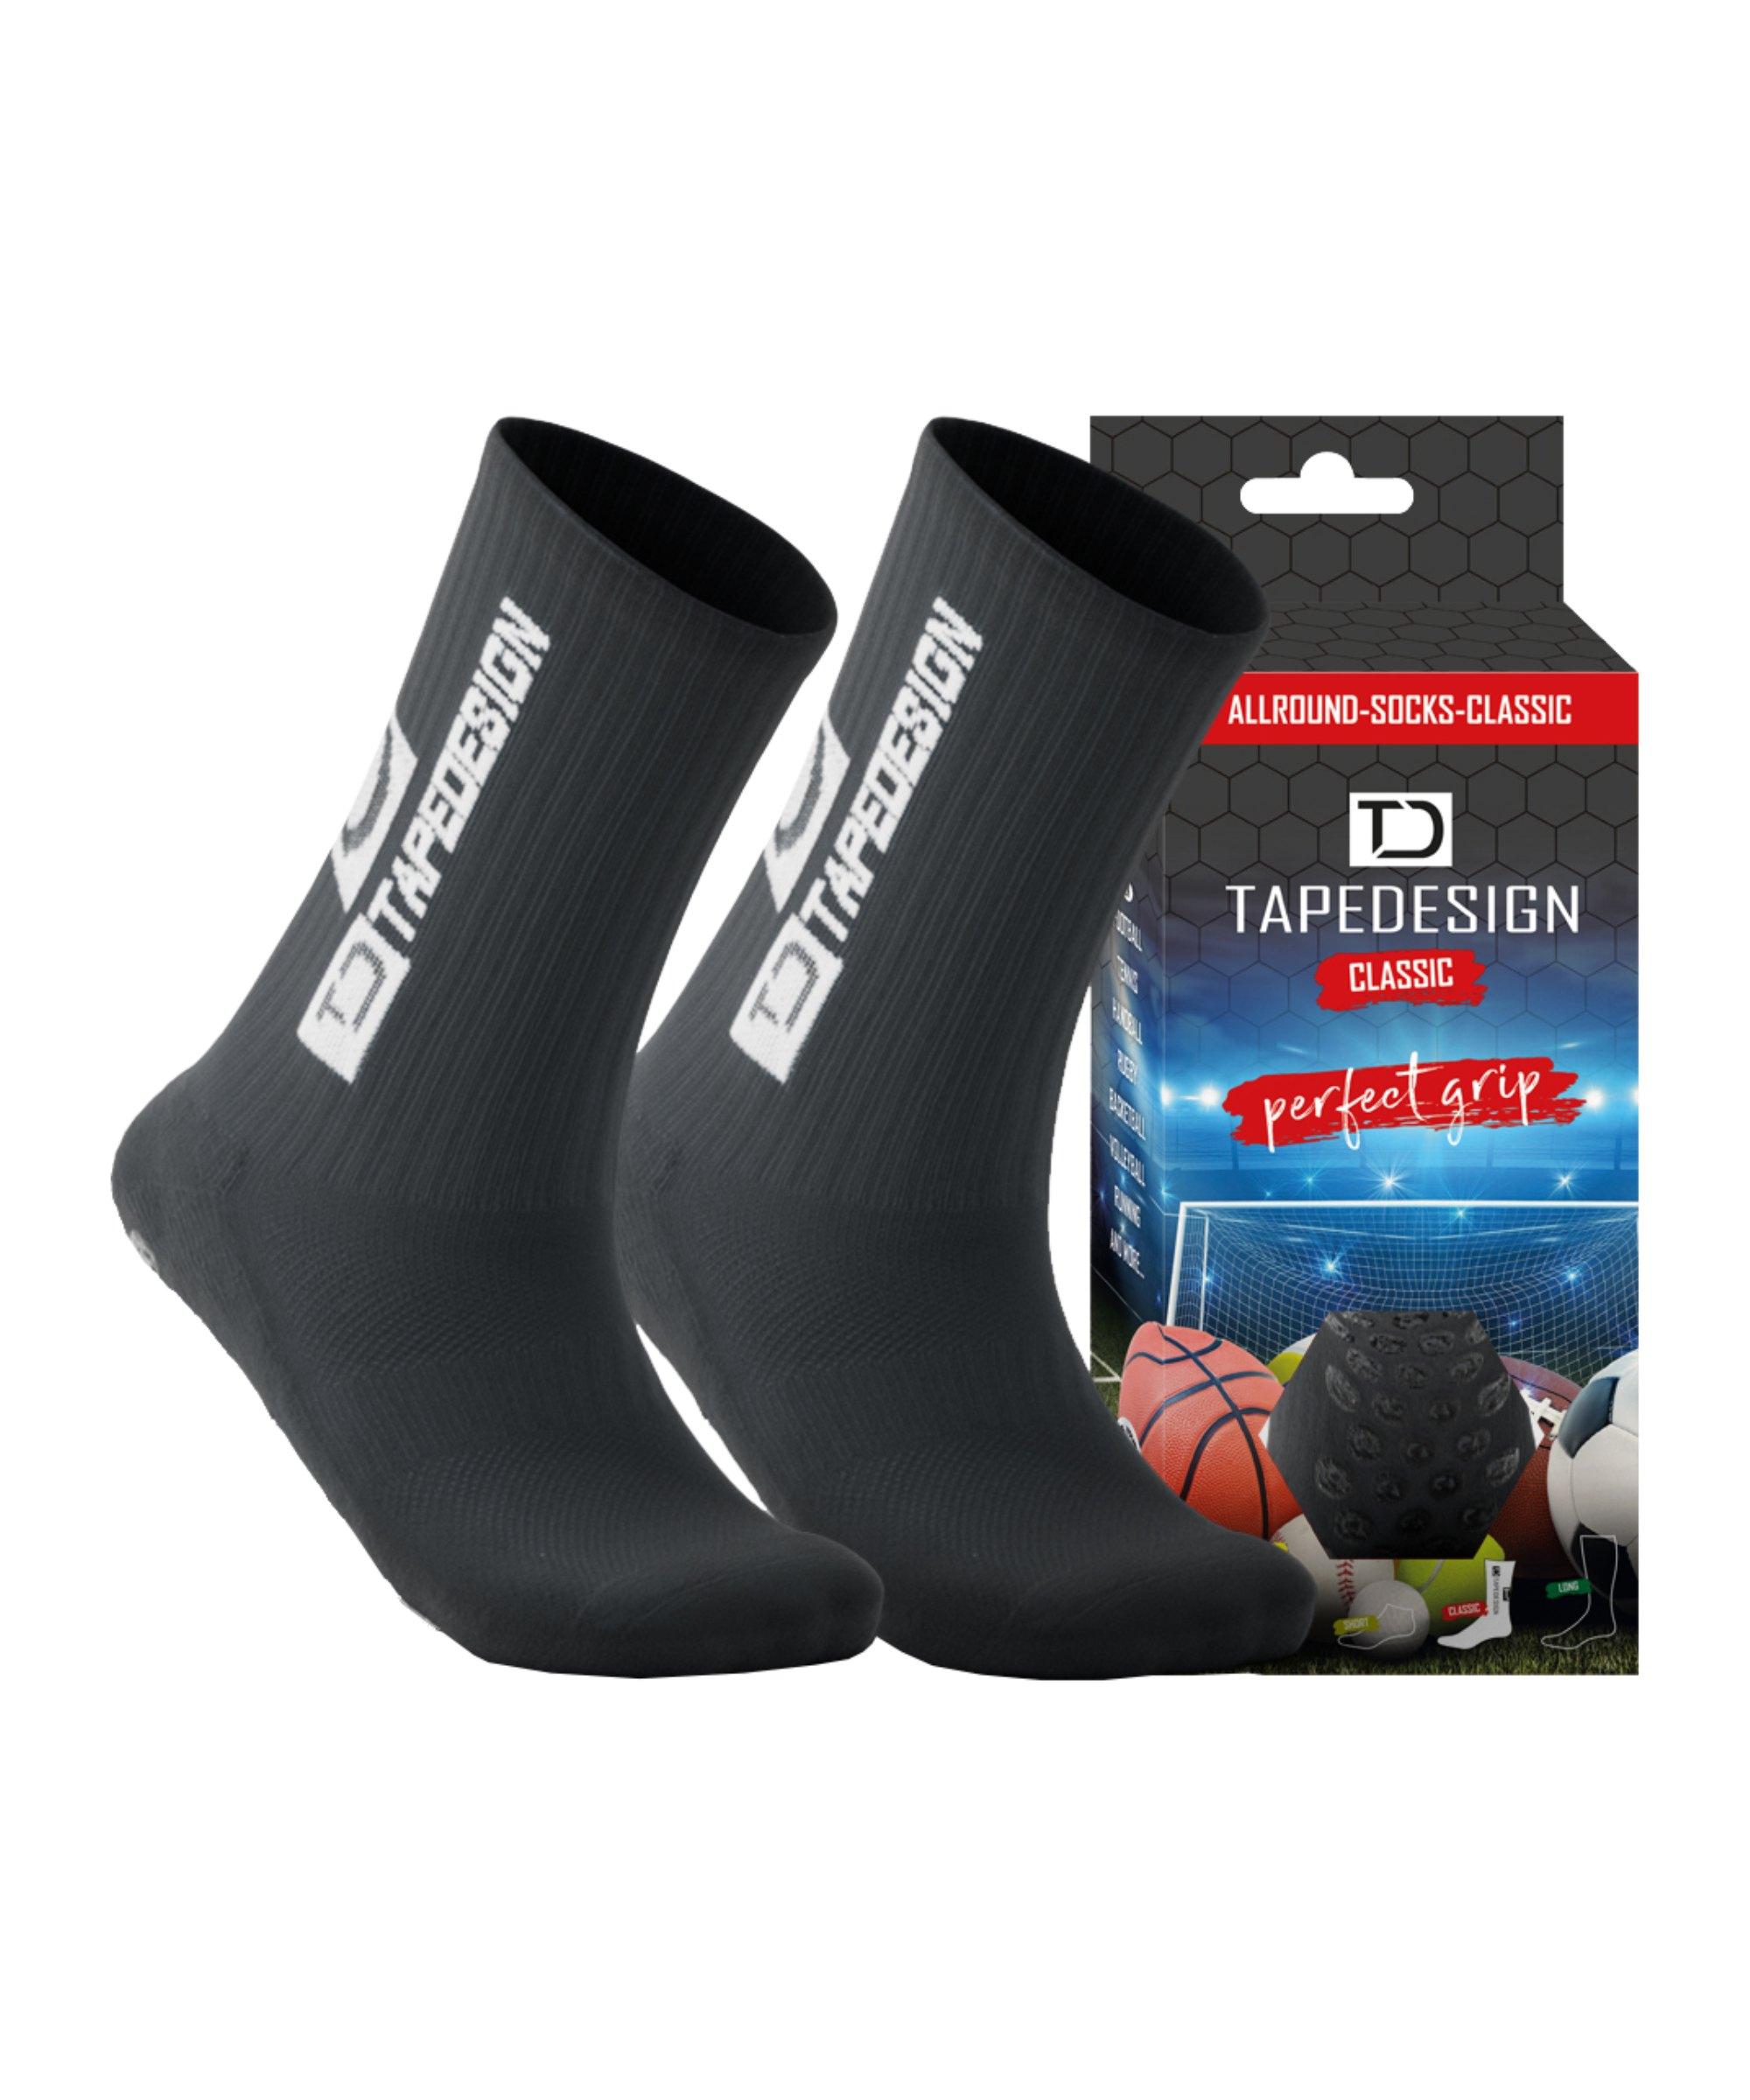 Tapedesign Gripsocks Socken Dunkelgrau F016 - grau